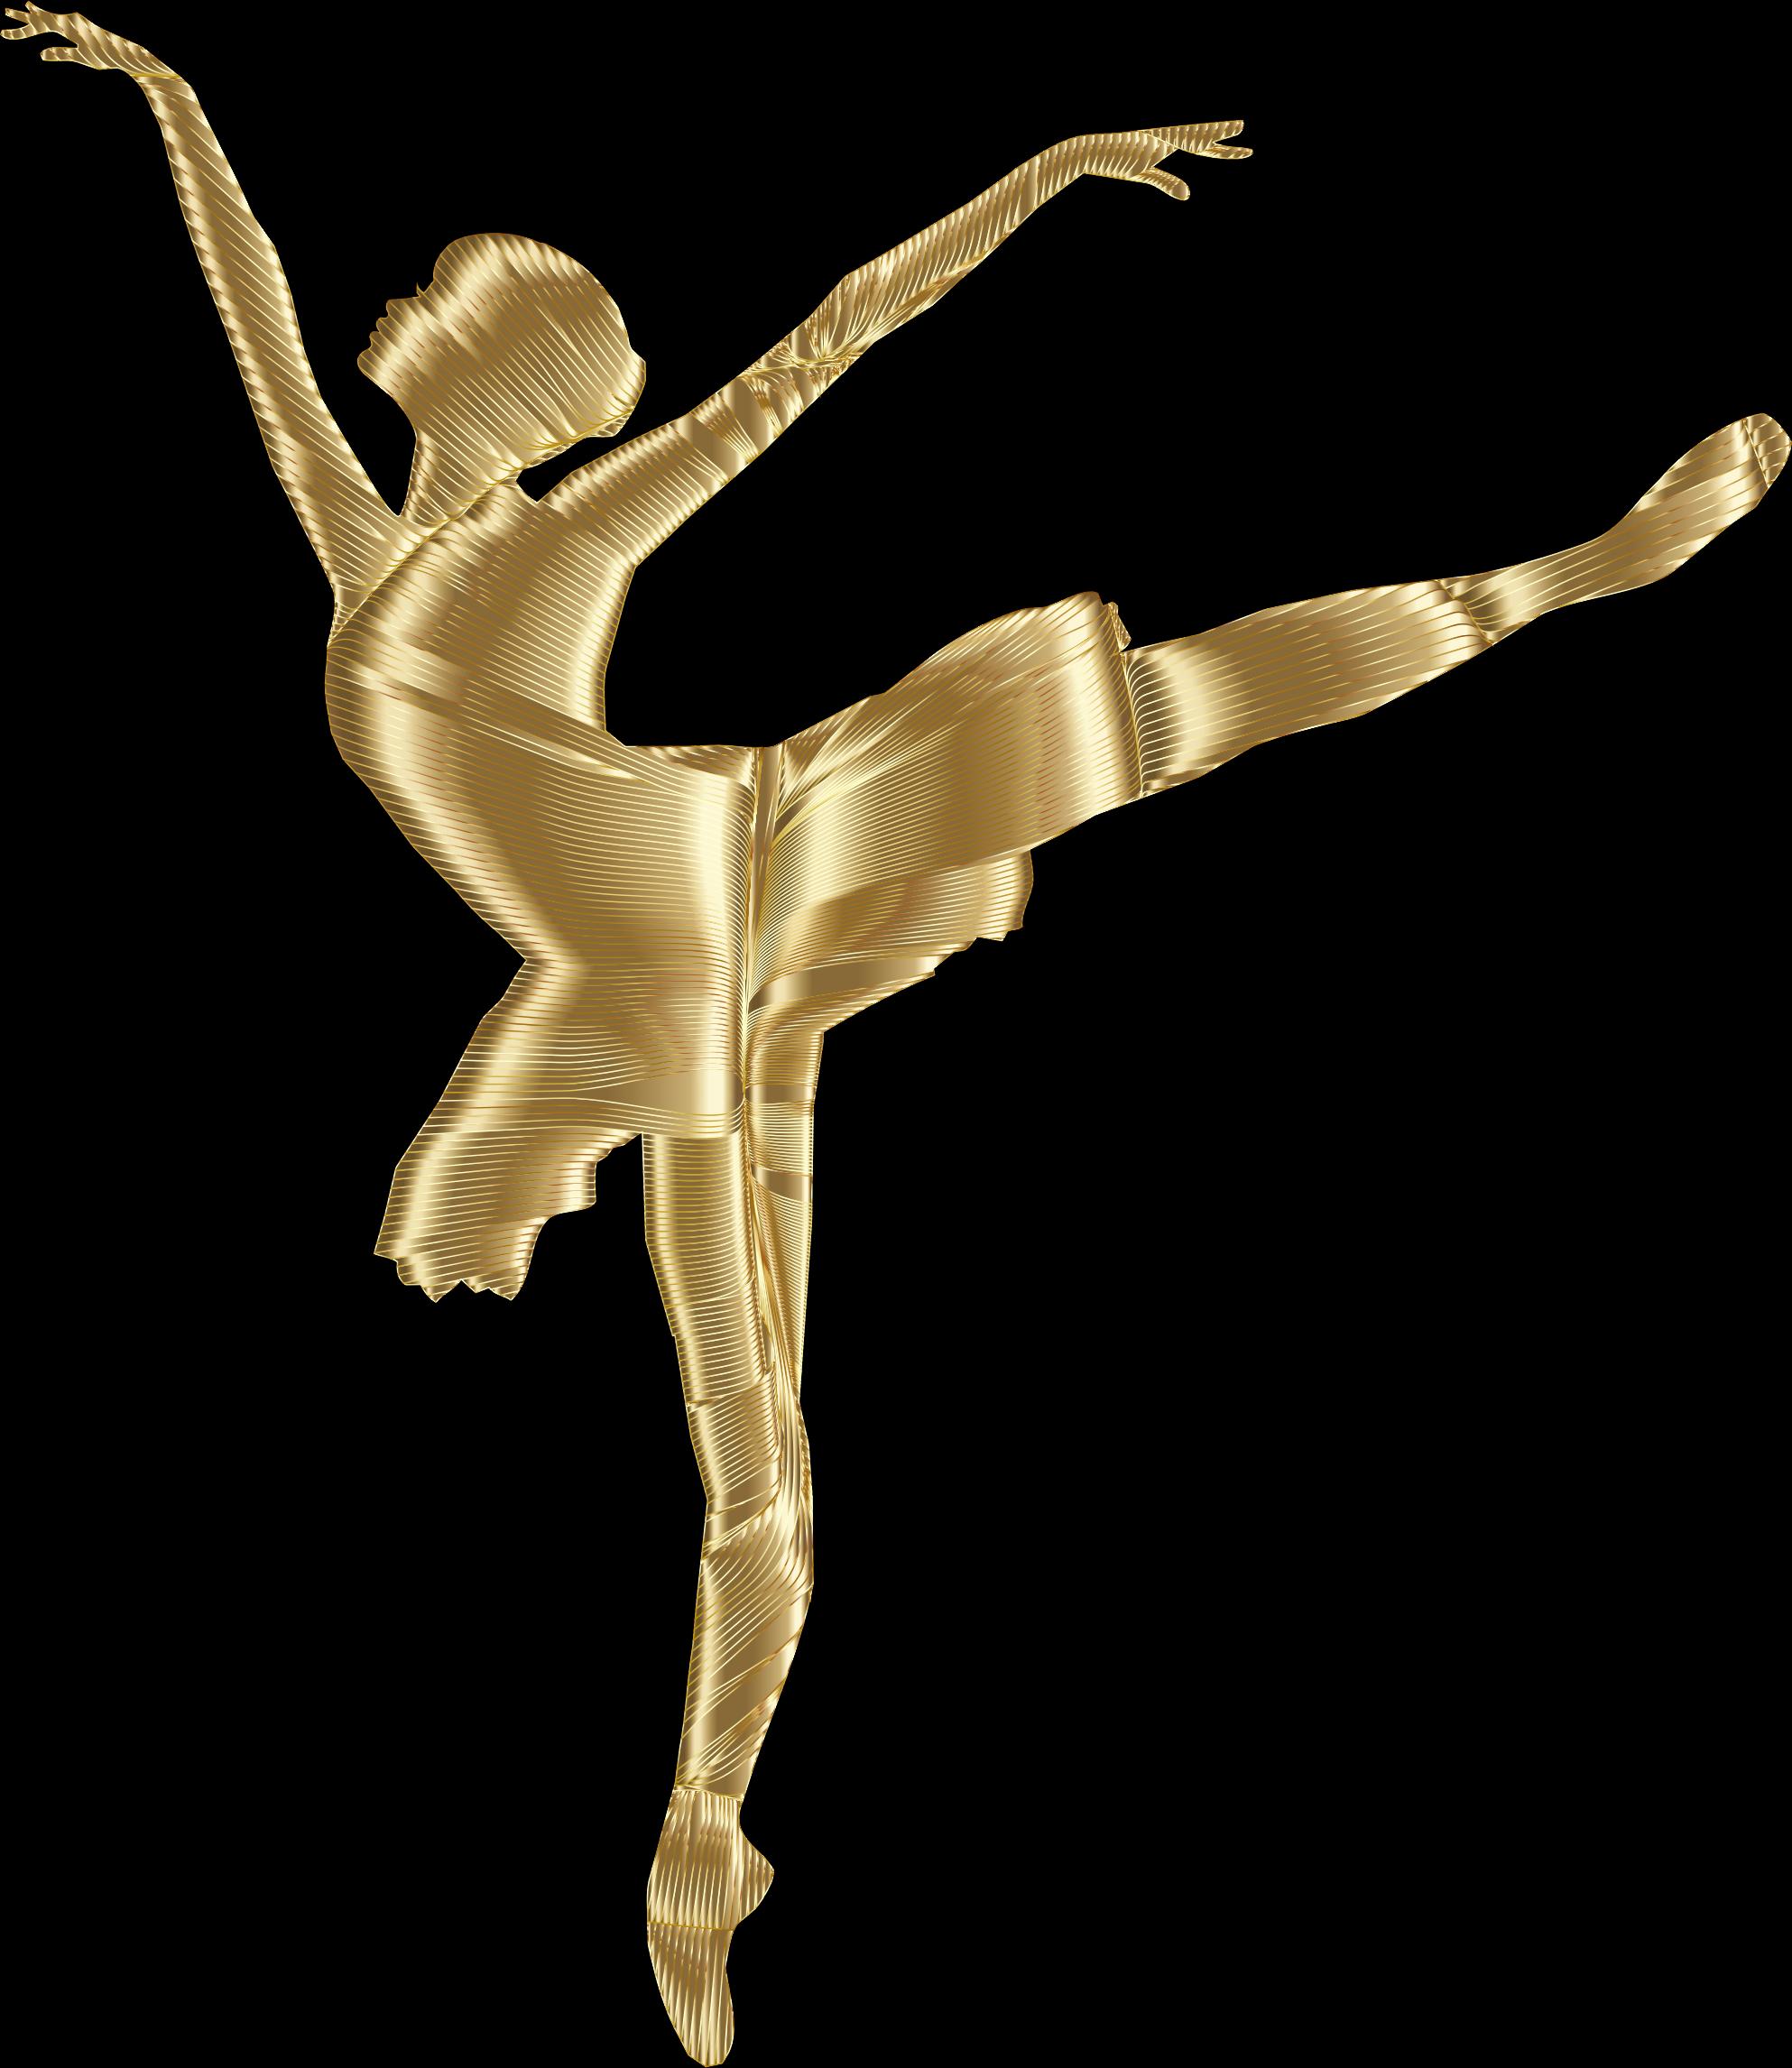 Ballerine clipart gold Ballerina background Ballerina Silhouette collection